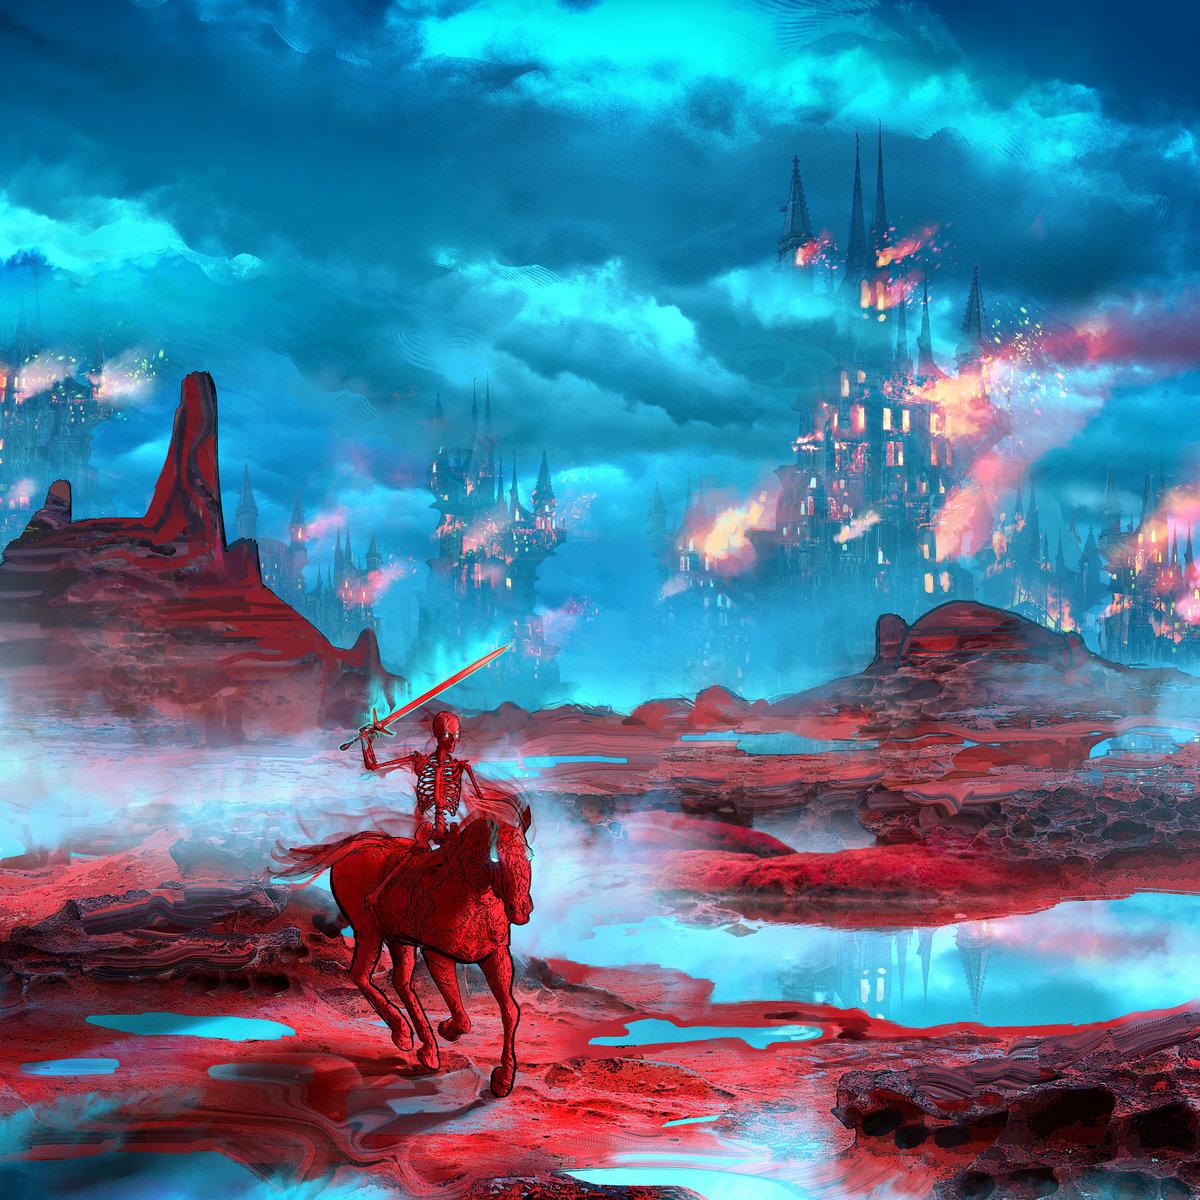 Red horse | bluetech.